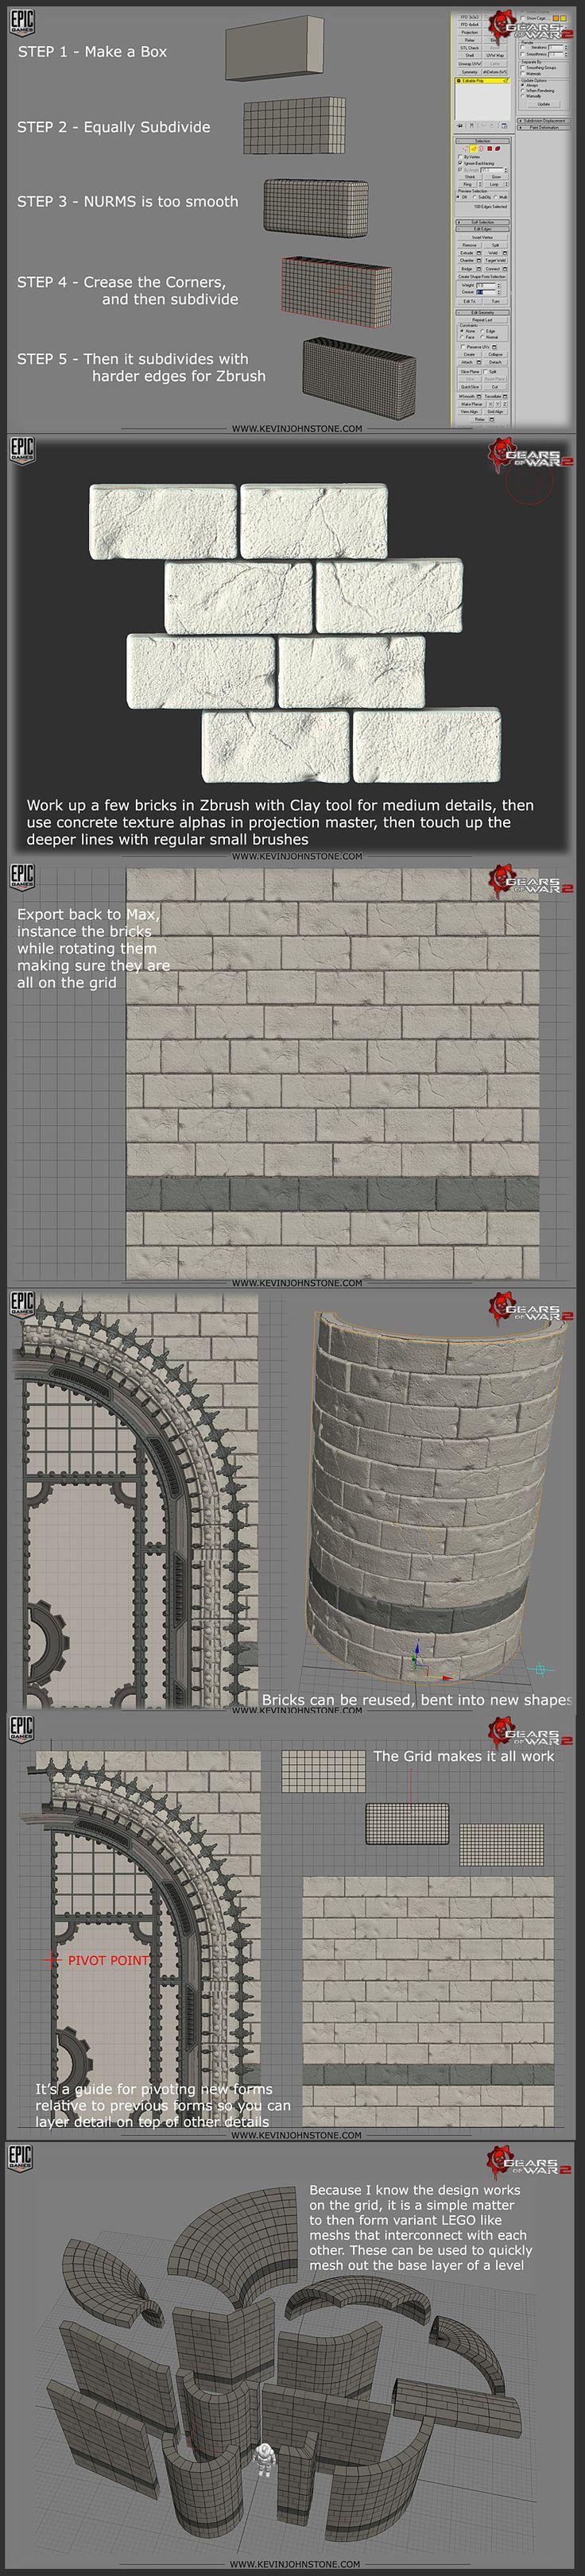 gears of war - modular tutorial - polycountthread